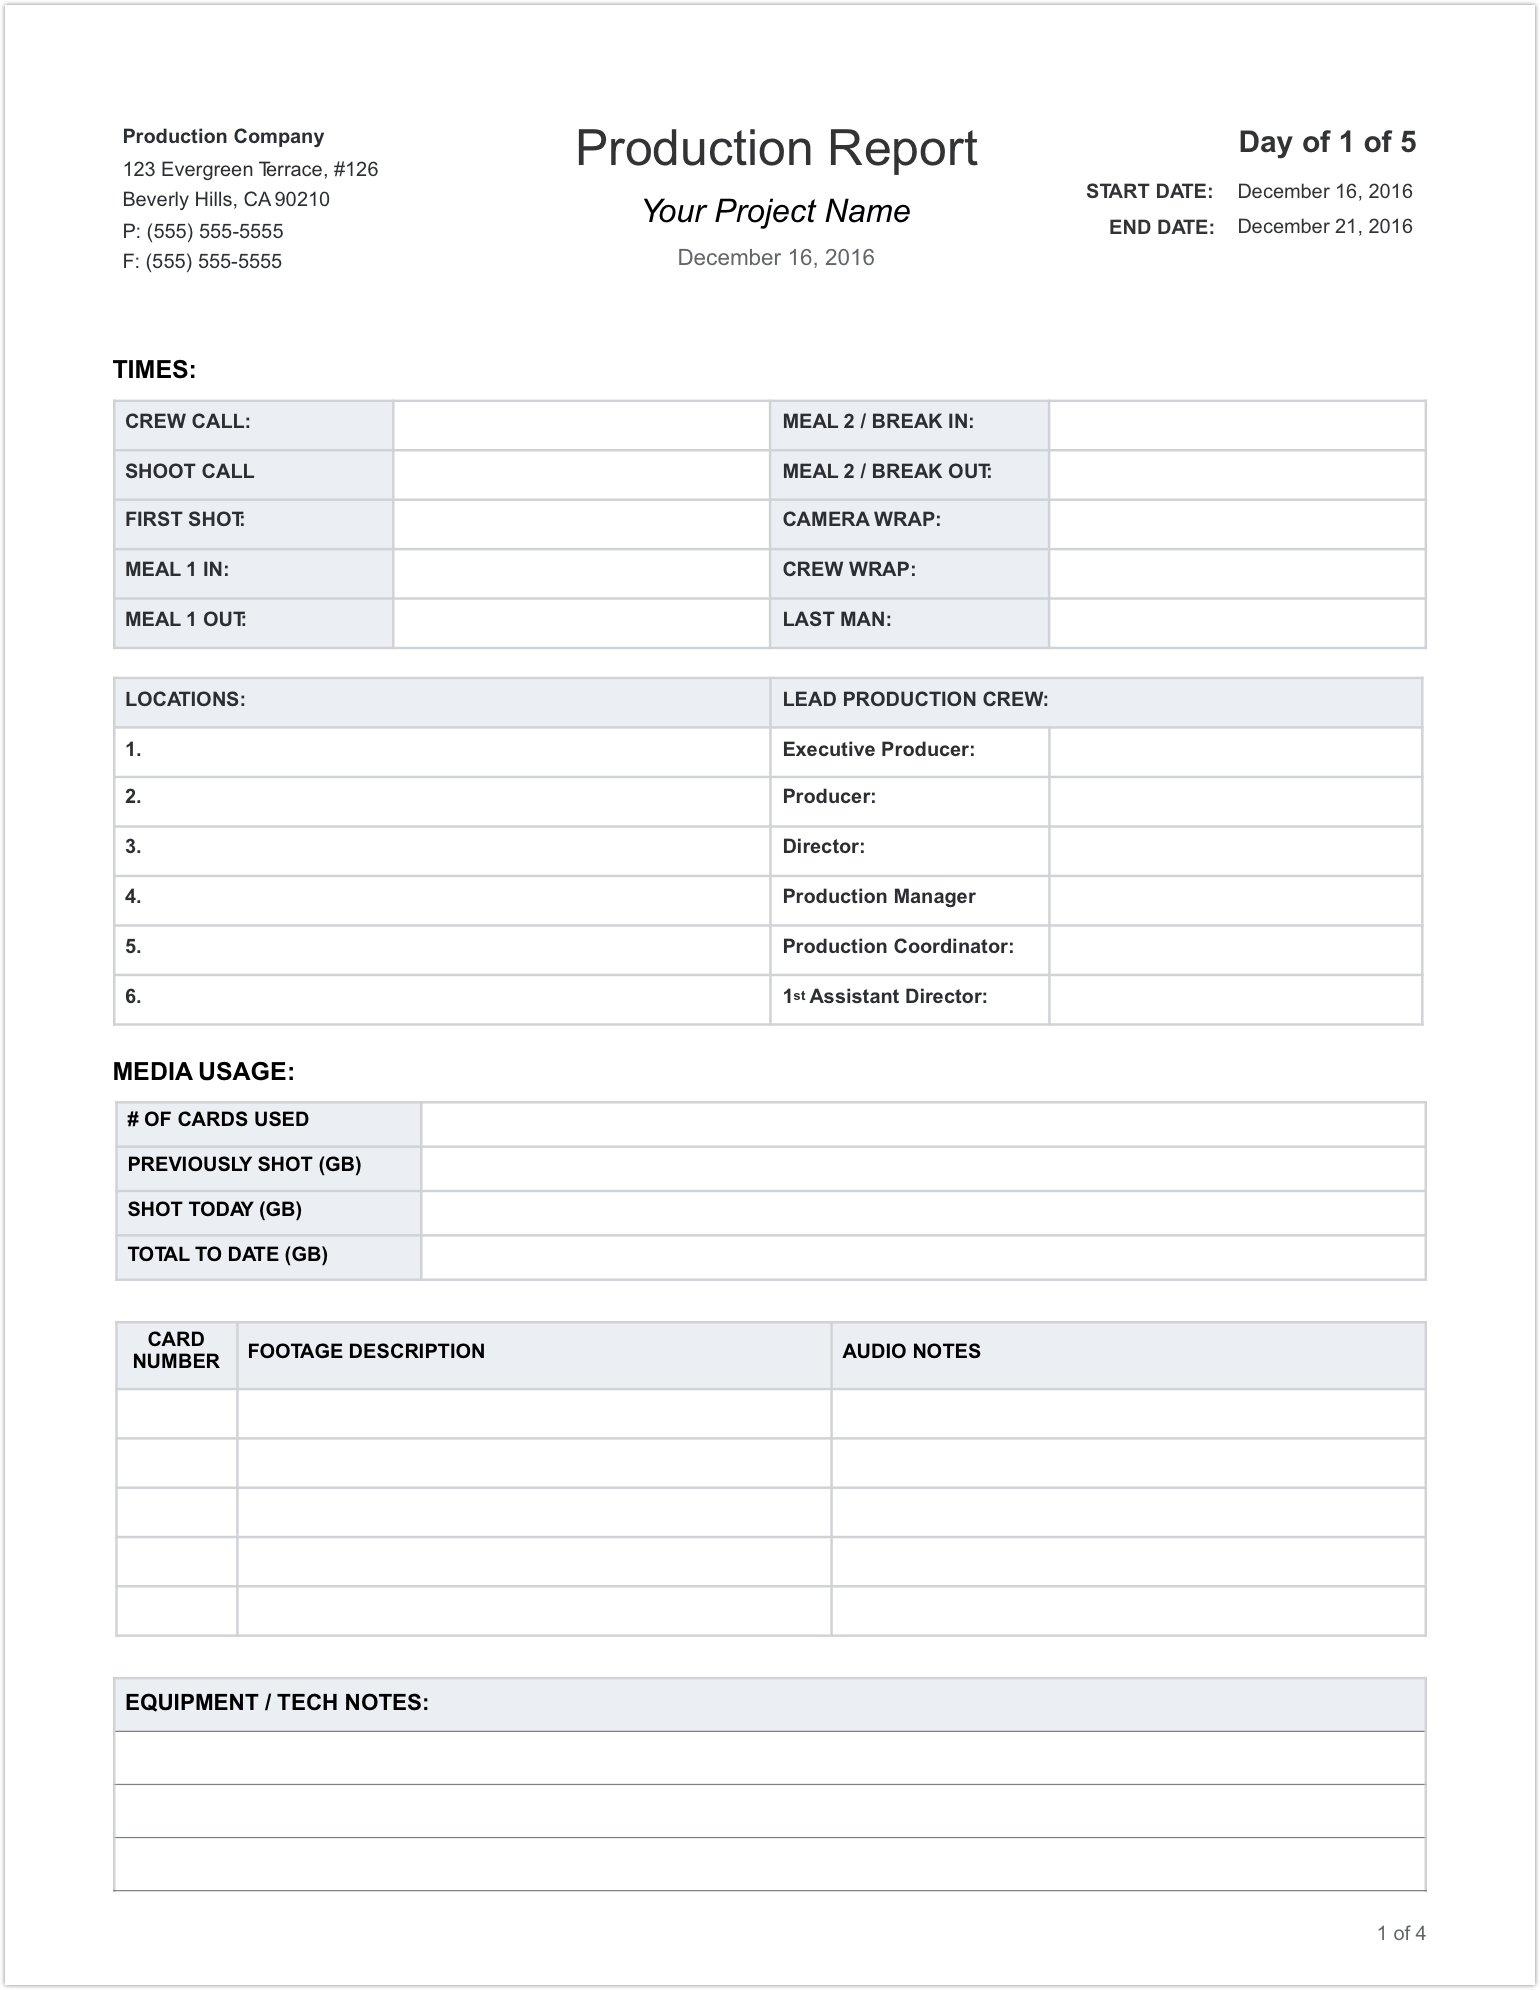 ebook Reputation Transfer to Enter New